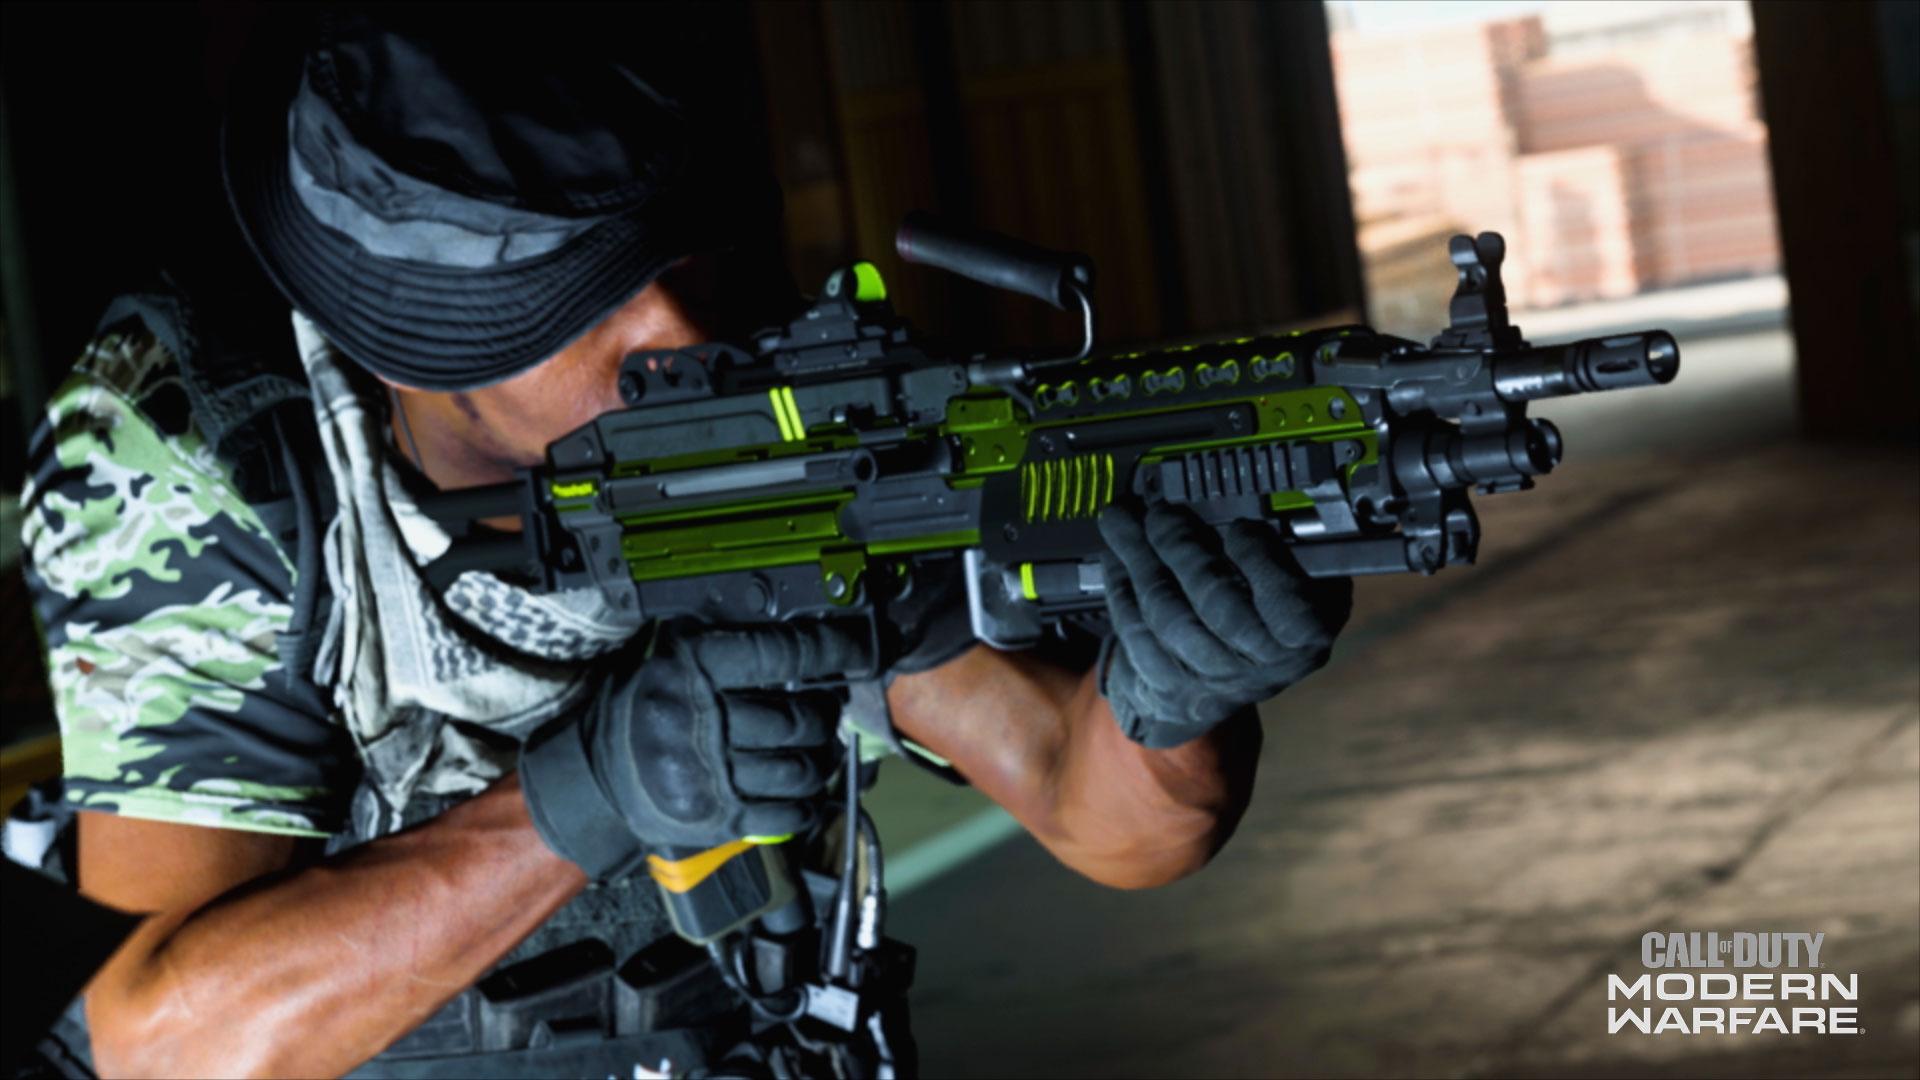 The Bruen MK9: How to Unlock the New LMG in Call of Duty®: Modern Warfare® - Image 2